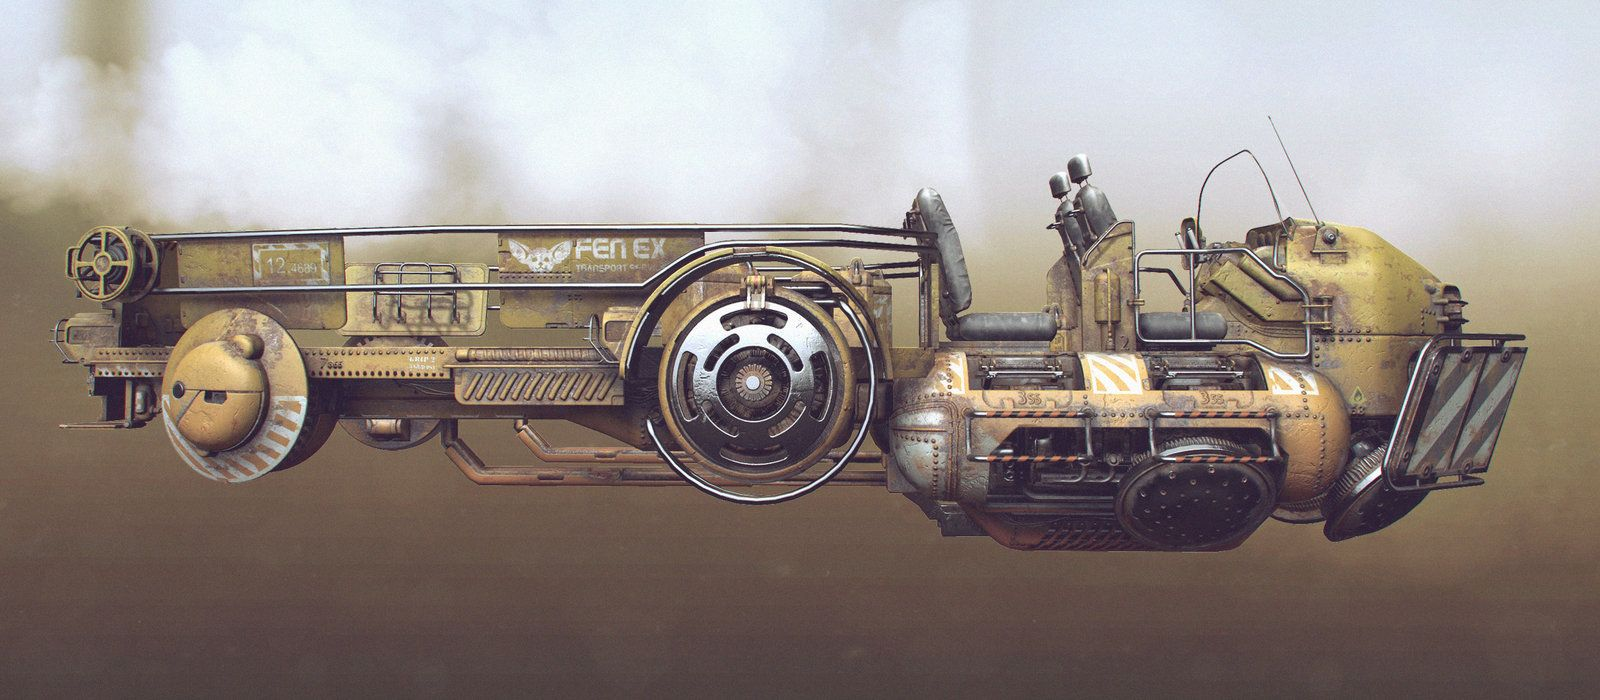 Transport vehicle Lowpoly, Tor Frick on ArtStation at https://www.artstation.com/artwork/QK68x